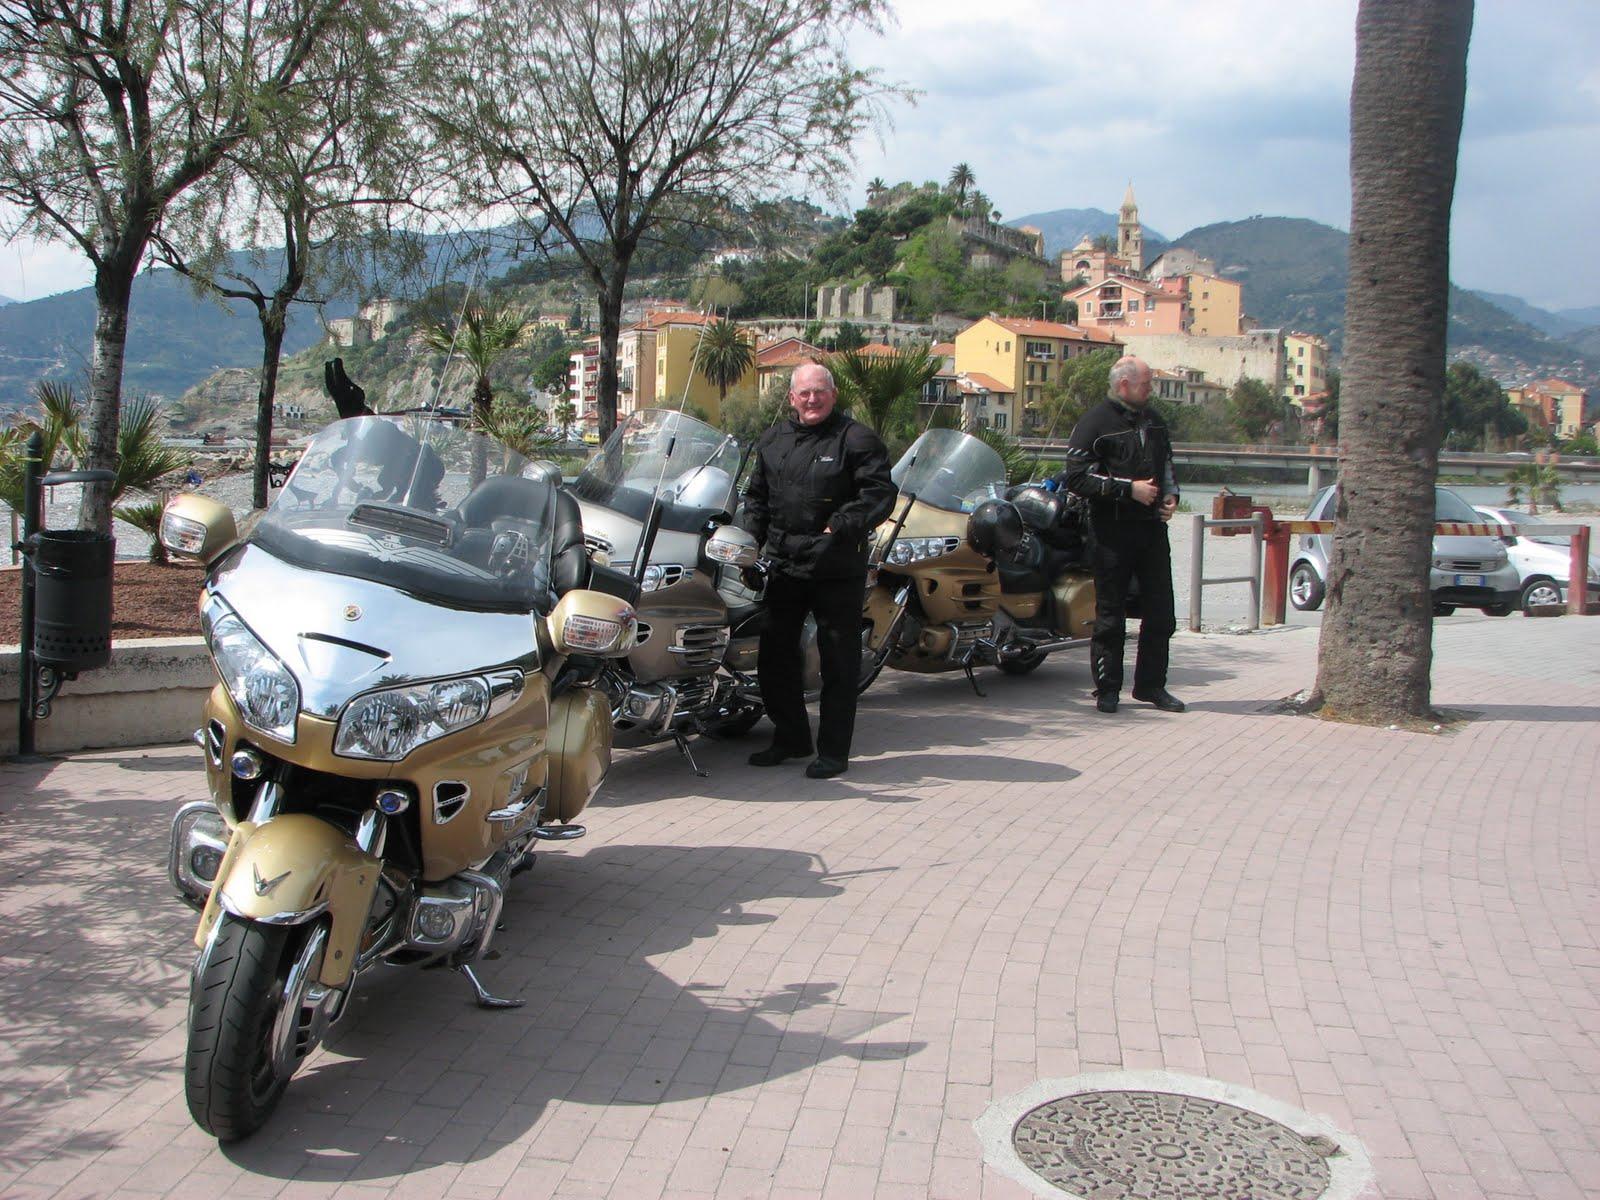 Goldwing express: tourenstiefel